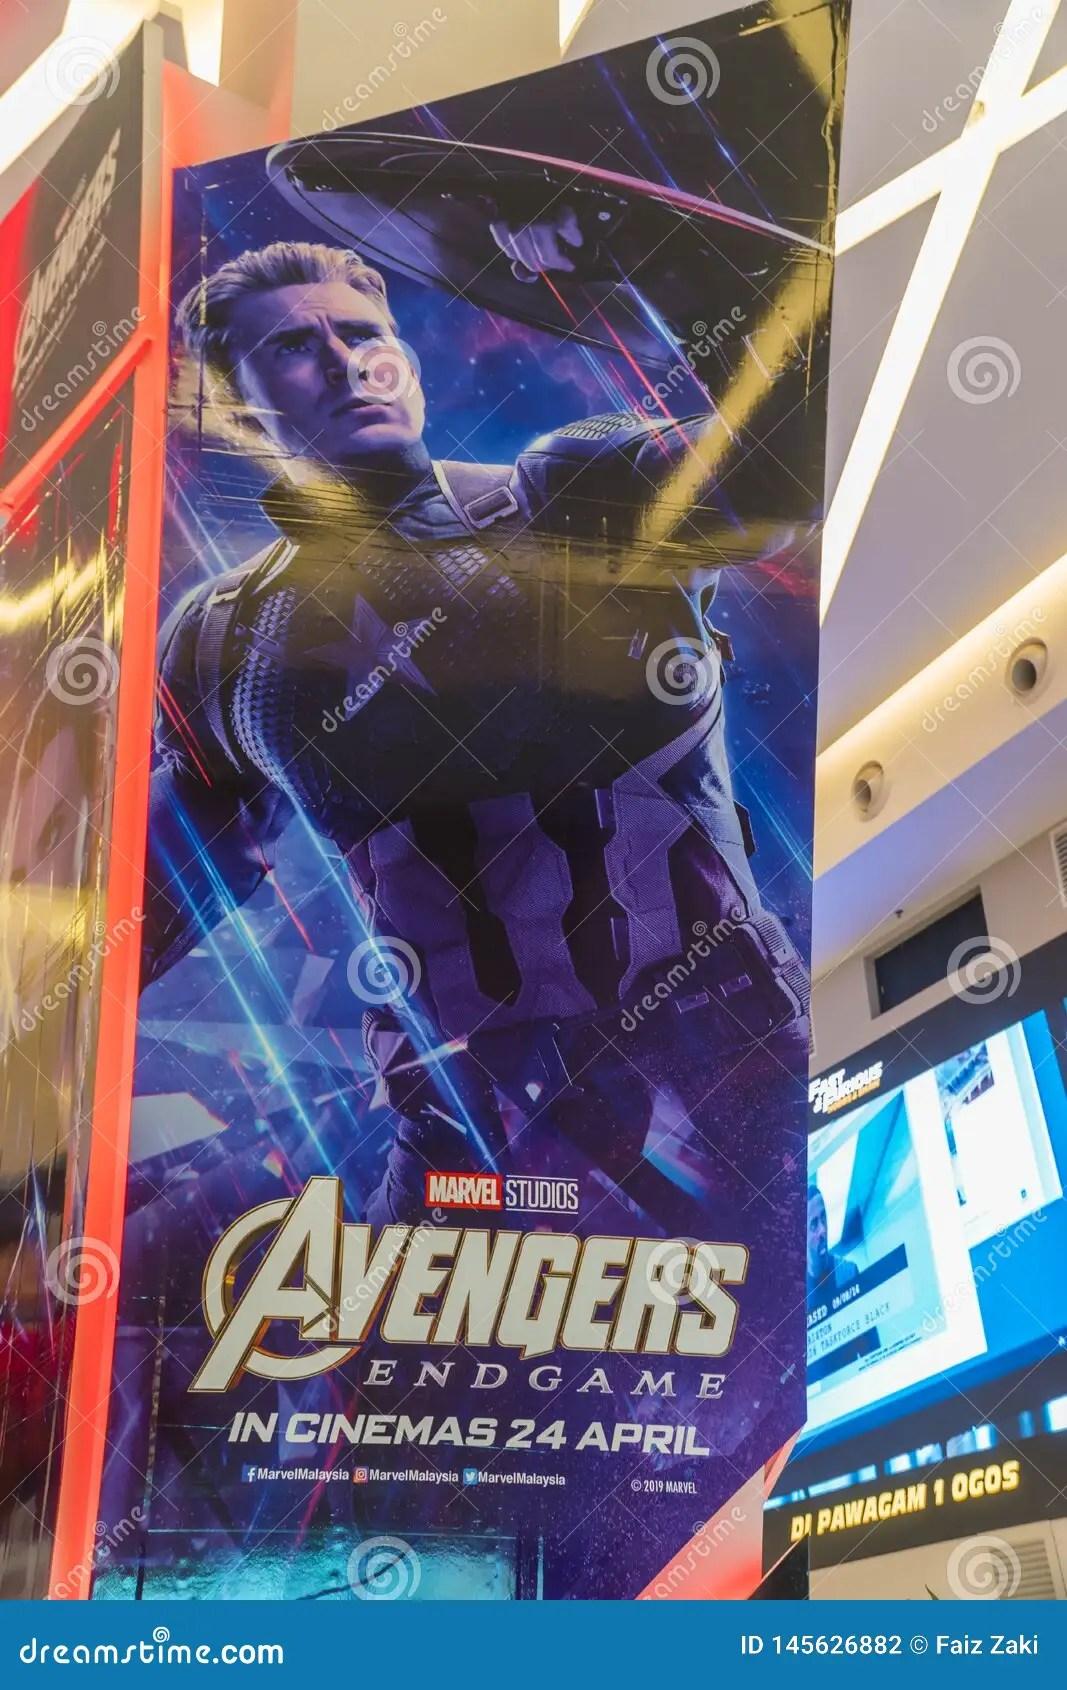 https www dreamstime com avengers endgame movie poster american superhero film based marvel comics superhero team kuala lumpur malaysia image145626882